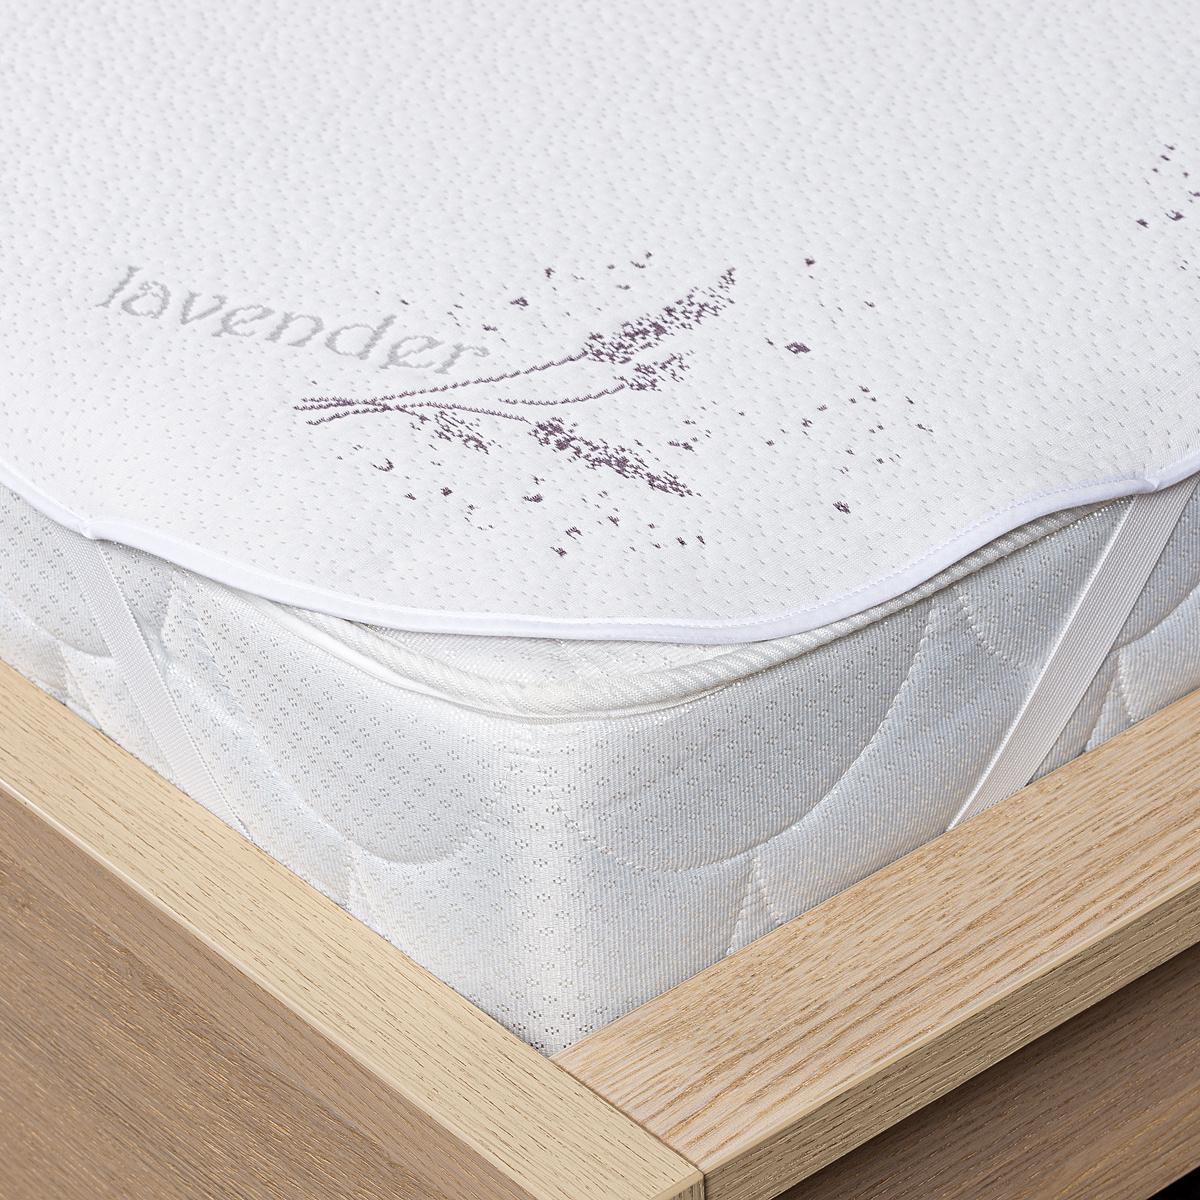 Protecție saltea 4Home Lavender cu elastic, 180 x 200 cm imagine 2021 e4home.ro